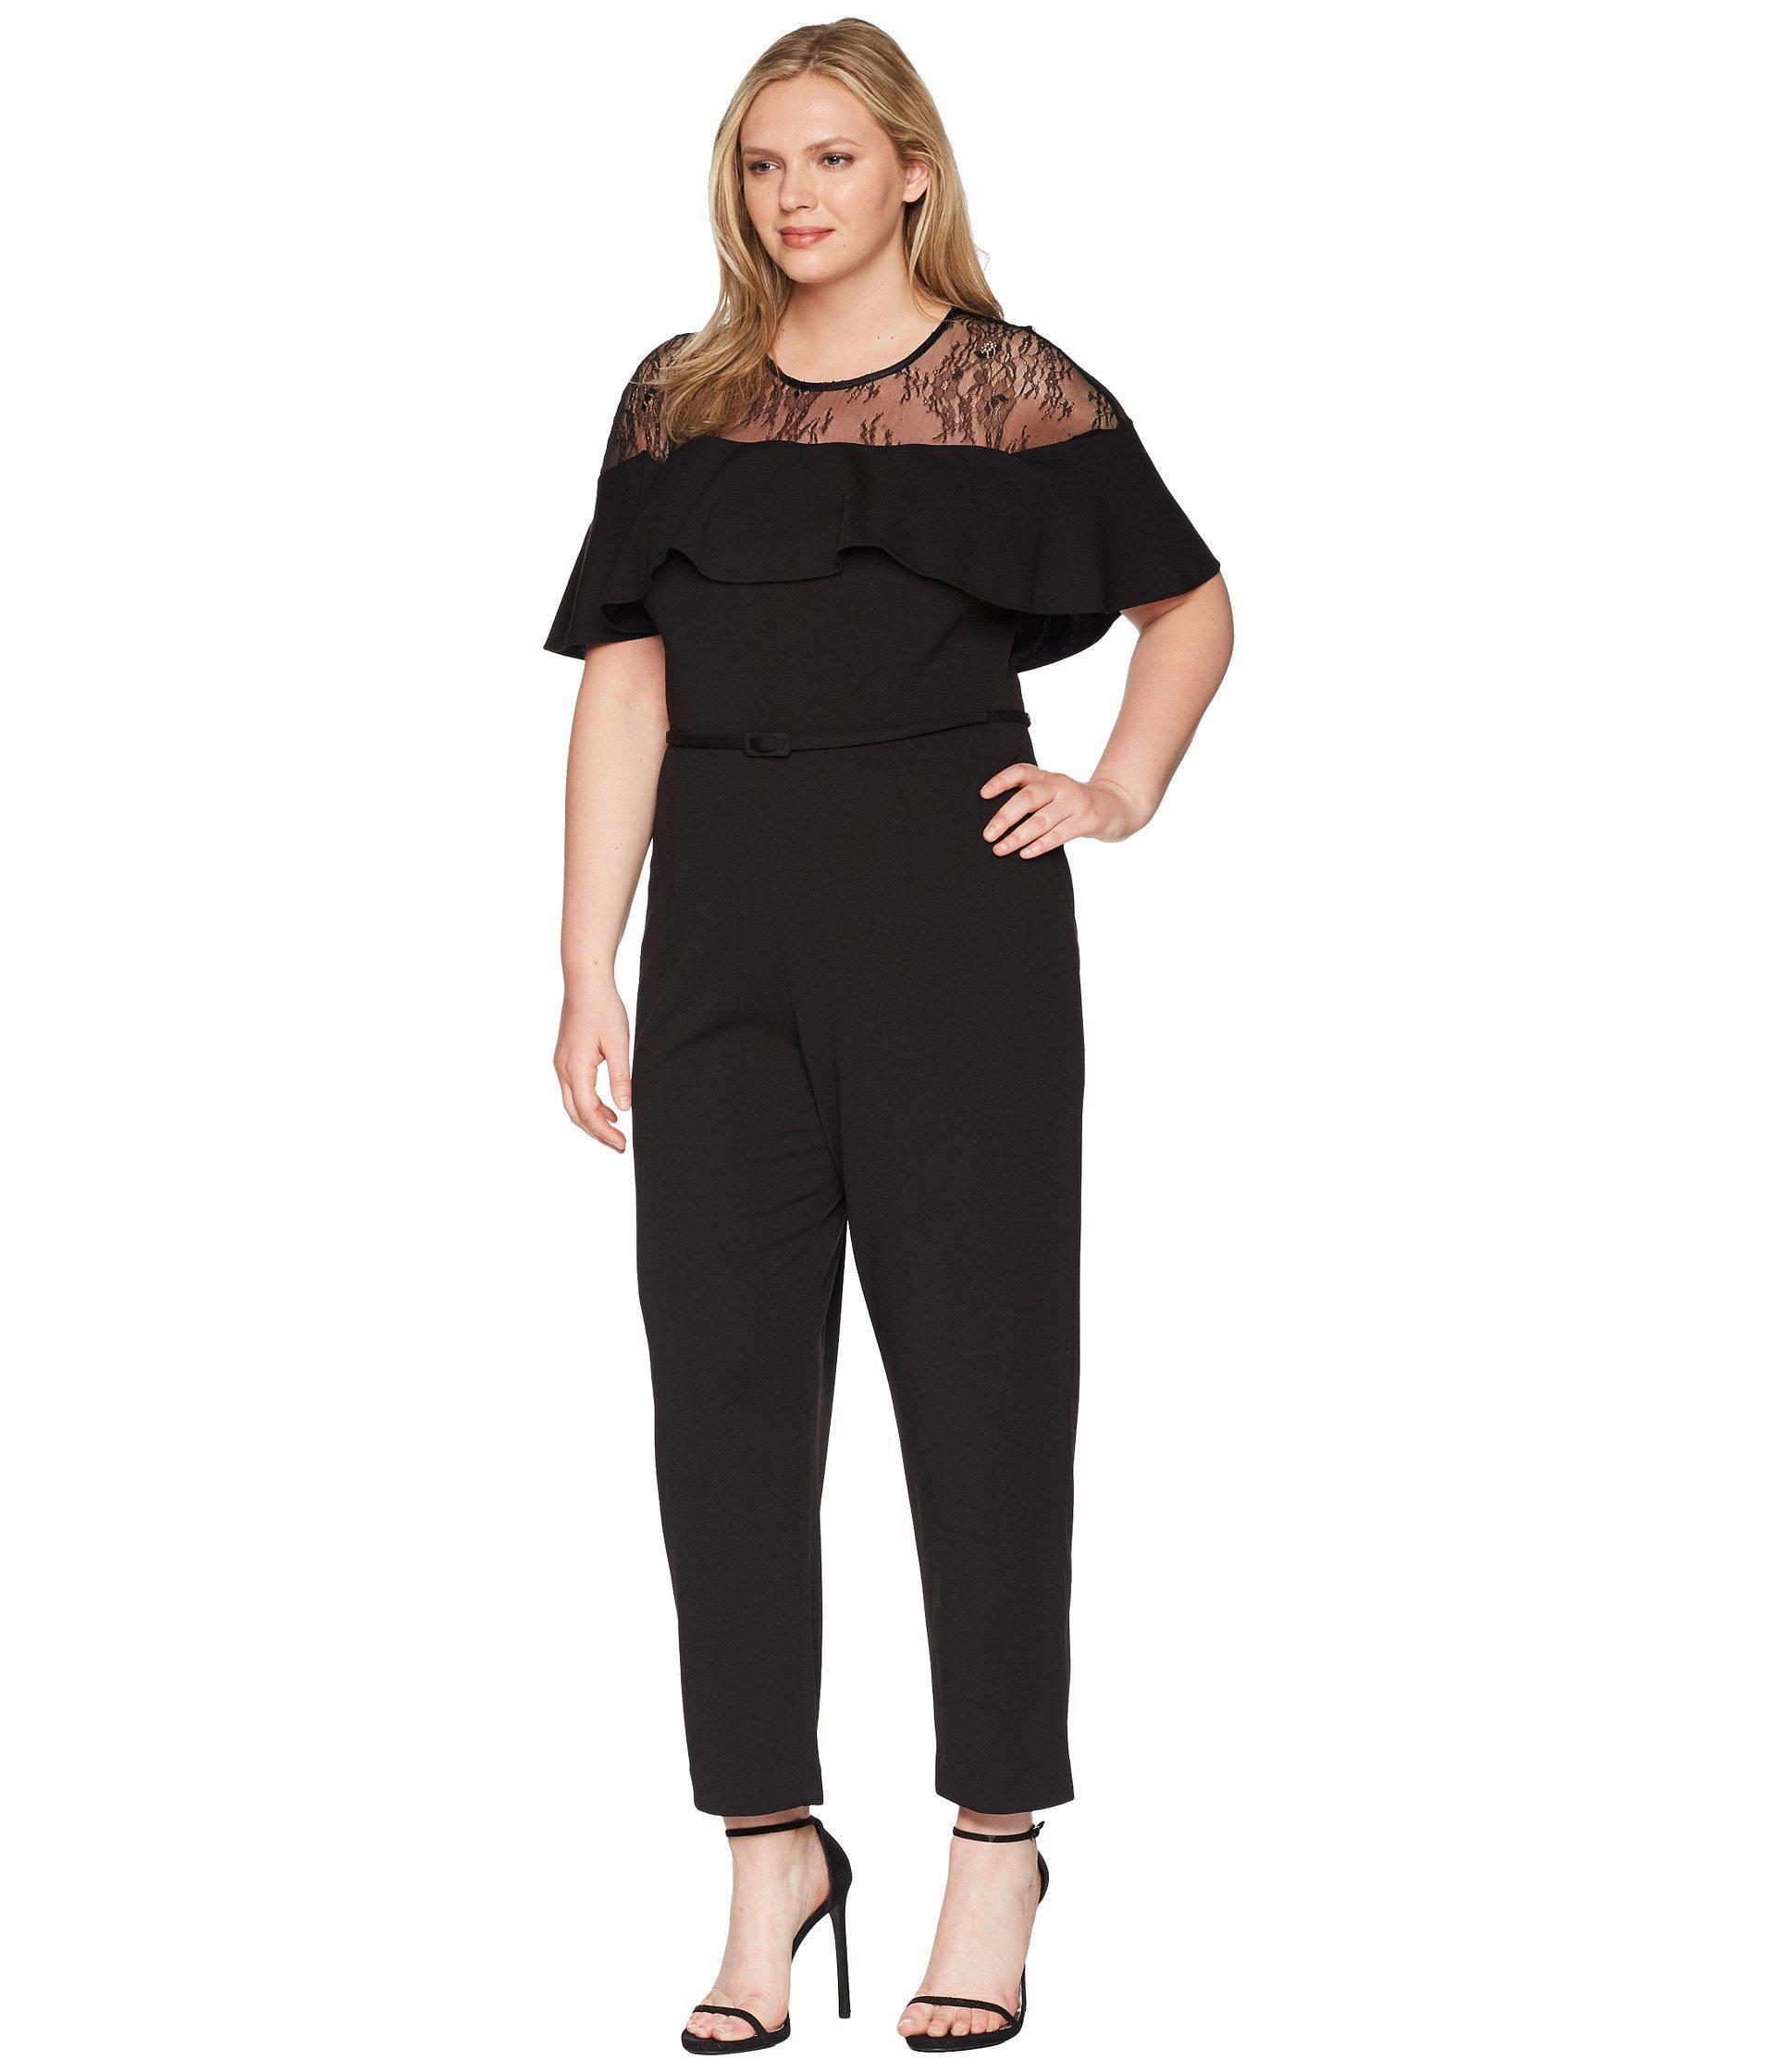 103cb2f7e8e Lyst - Adrianna Papell Plus Size Illusion Neckline Jumpsuit in Black - Save  30%